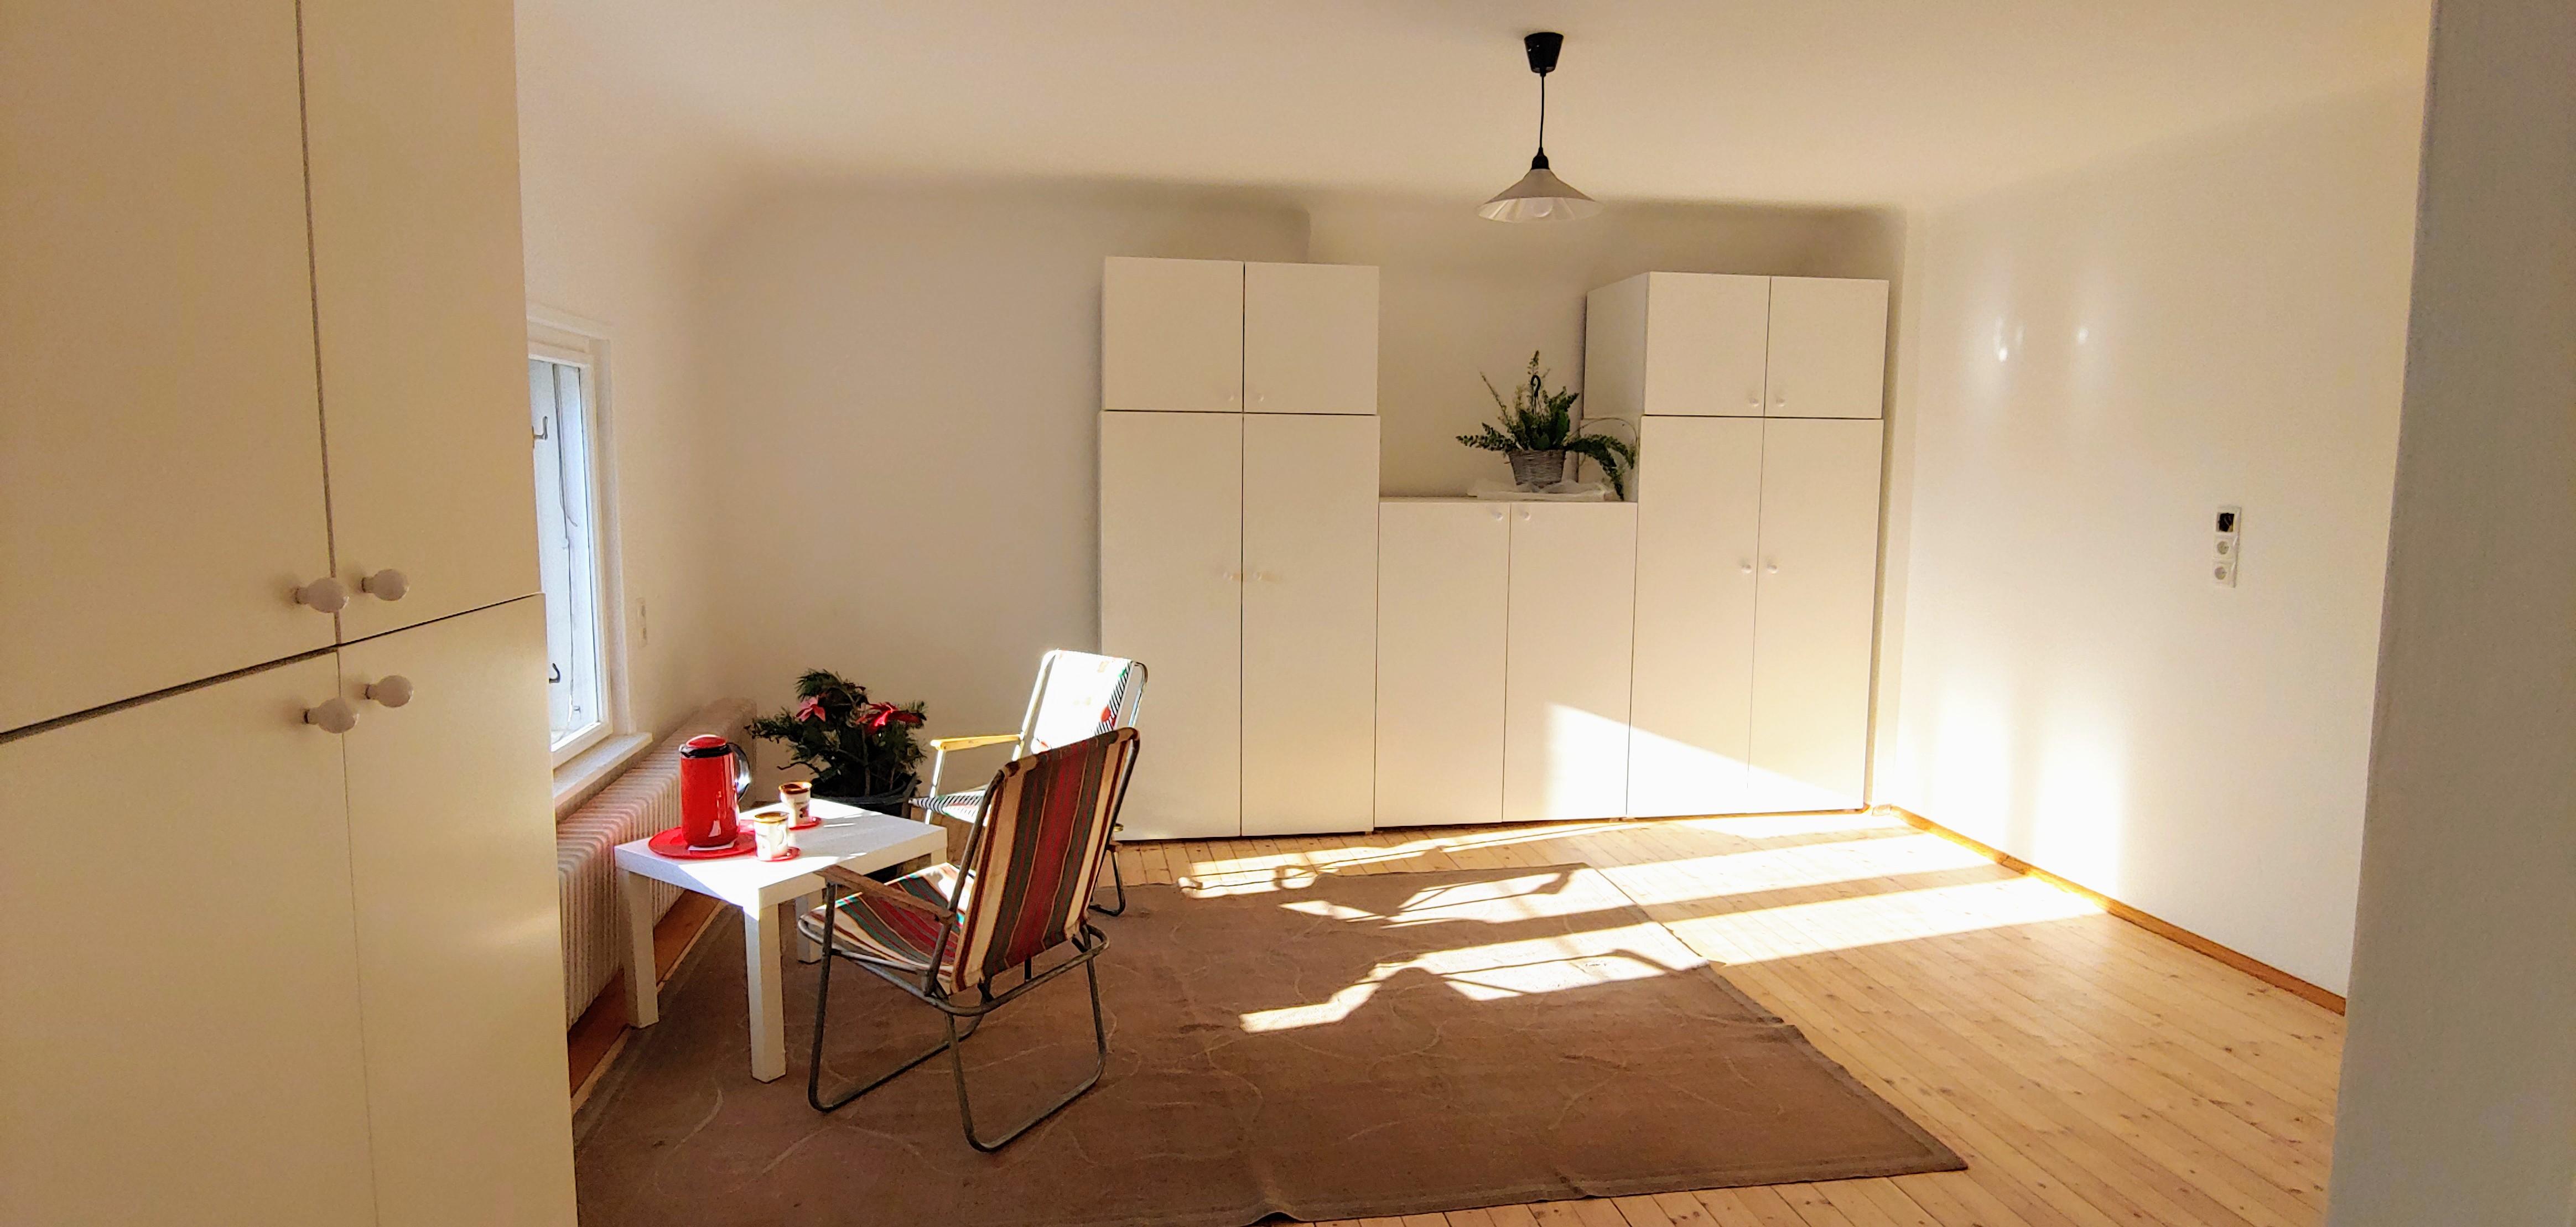 SINGLE-Wohnung in Hietzing! | huggology.com